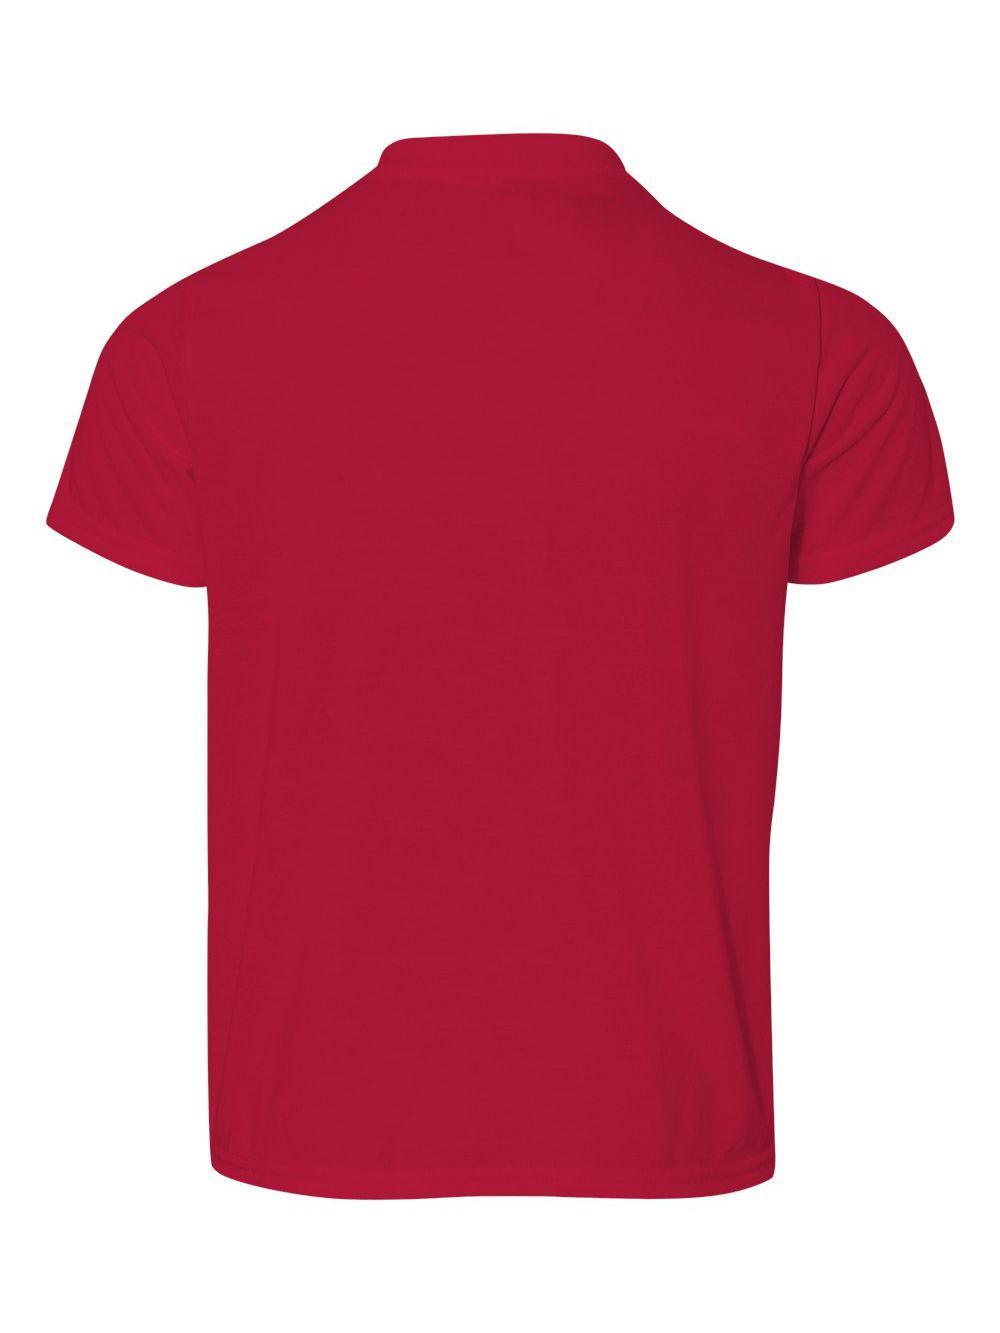 Gildan-Performance-Youth-T-Shirt-42000B thumbnail 16